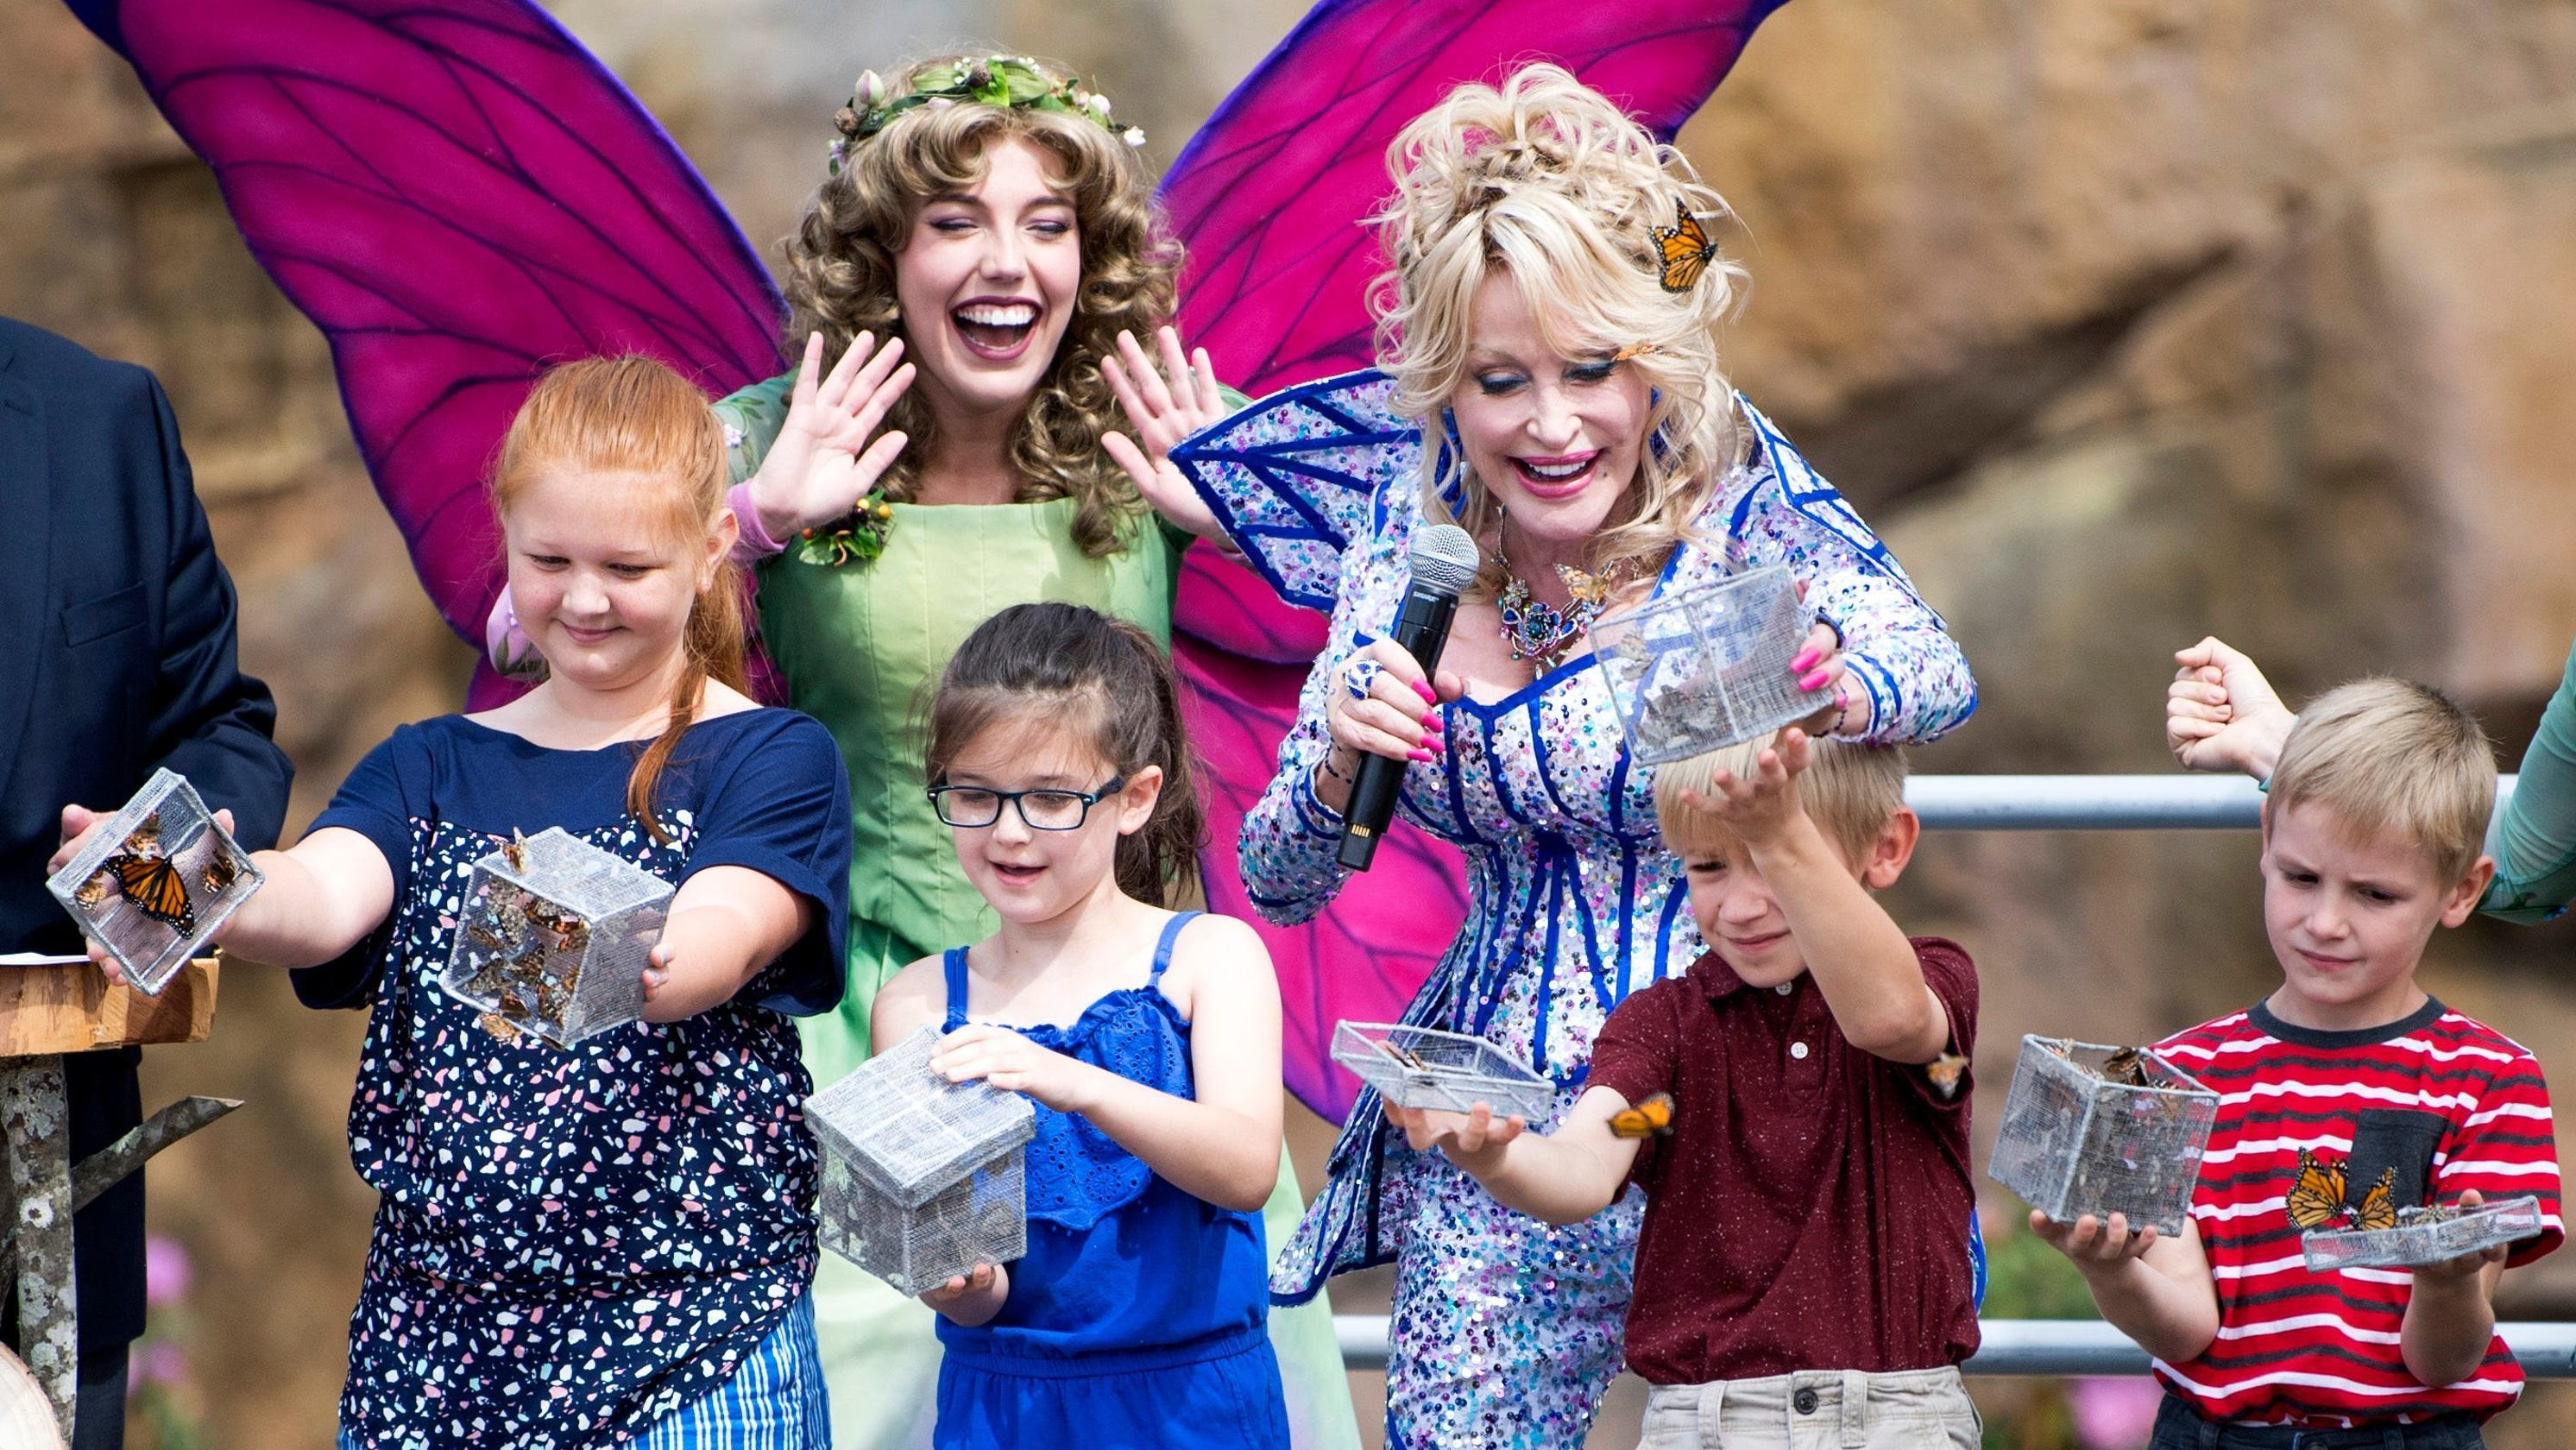 Dollywood opens new Wildwood Grove theme park area